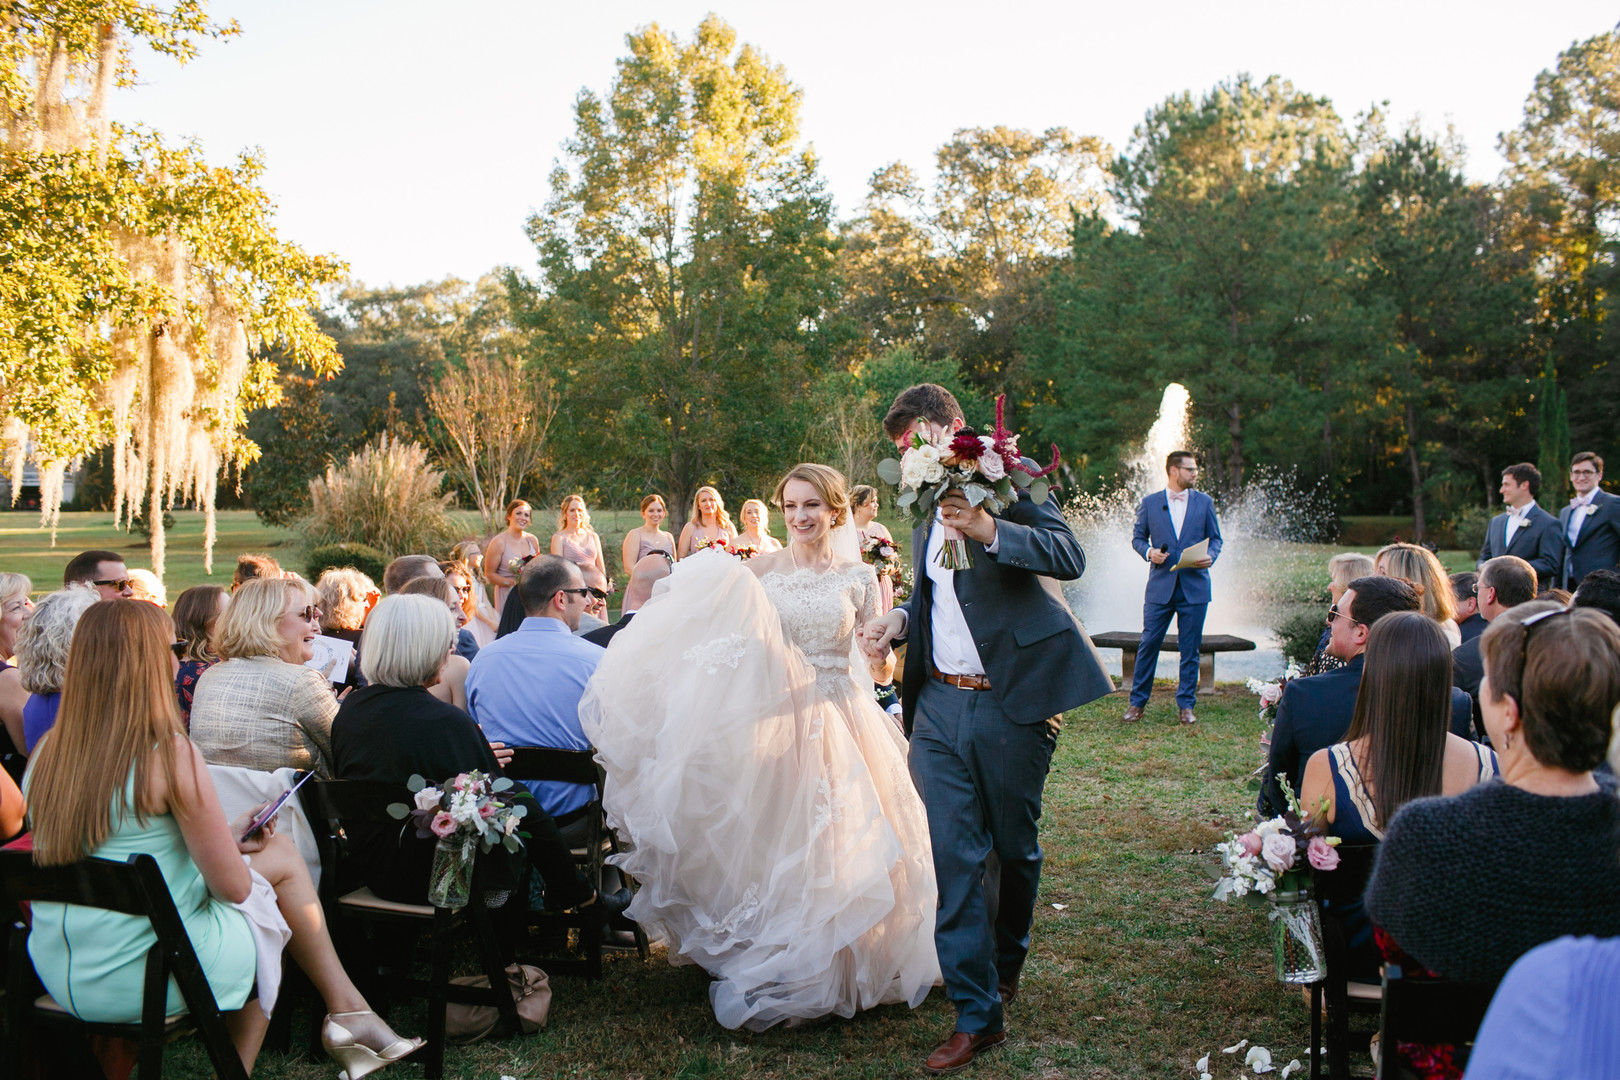 old-wide-awake-plantation-wedding-20.JPG